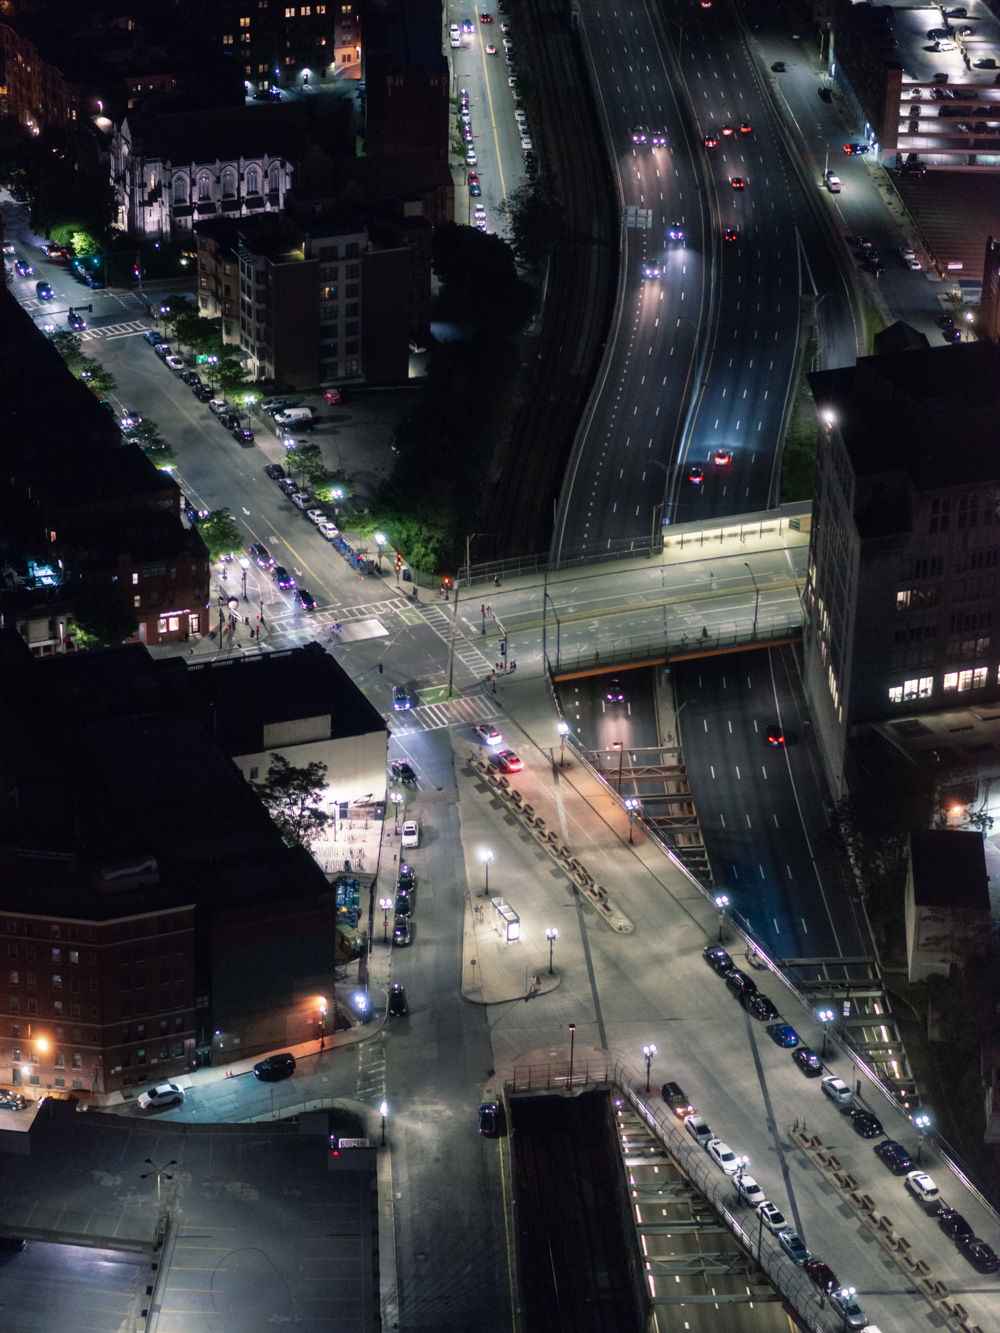 Boston, Massachusetts Turnpike, Interstate 90